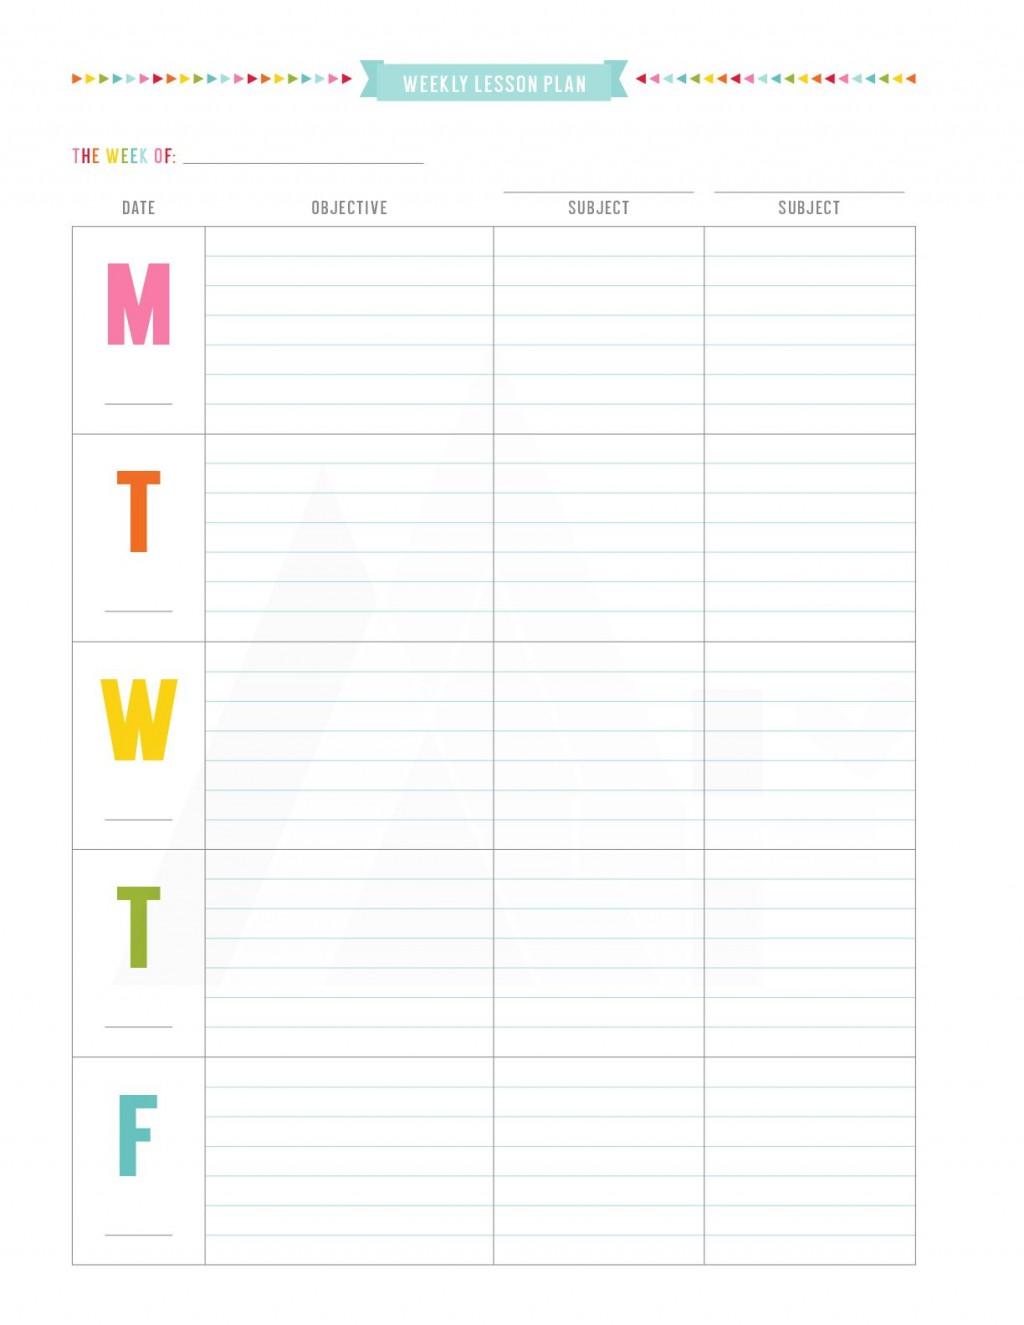 005 Unusual Fillable Lesson Plan Template Free High Resolution  Printable EditableLarge